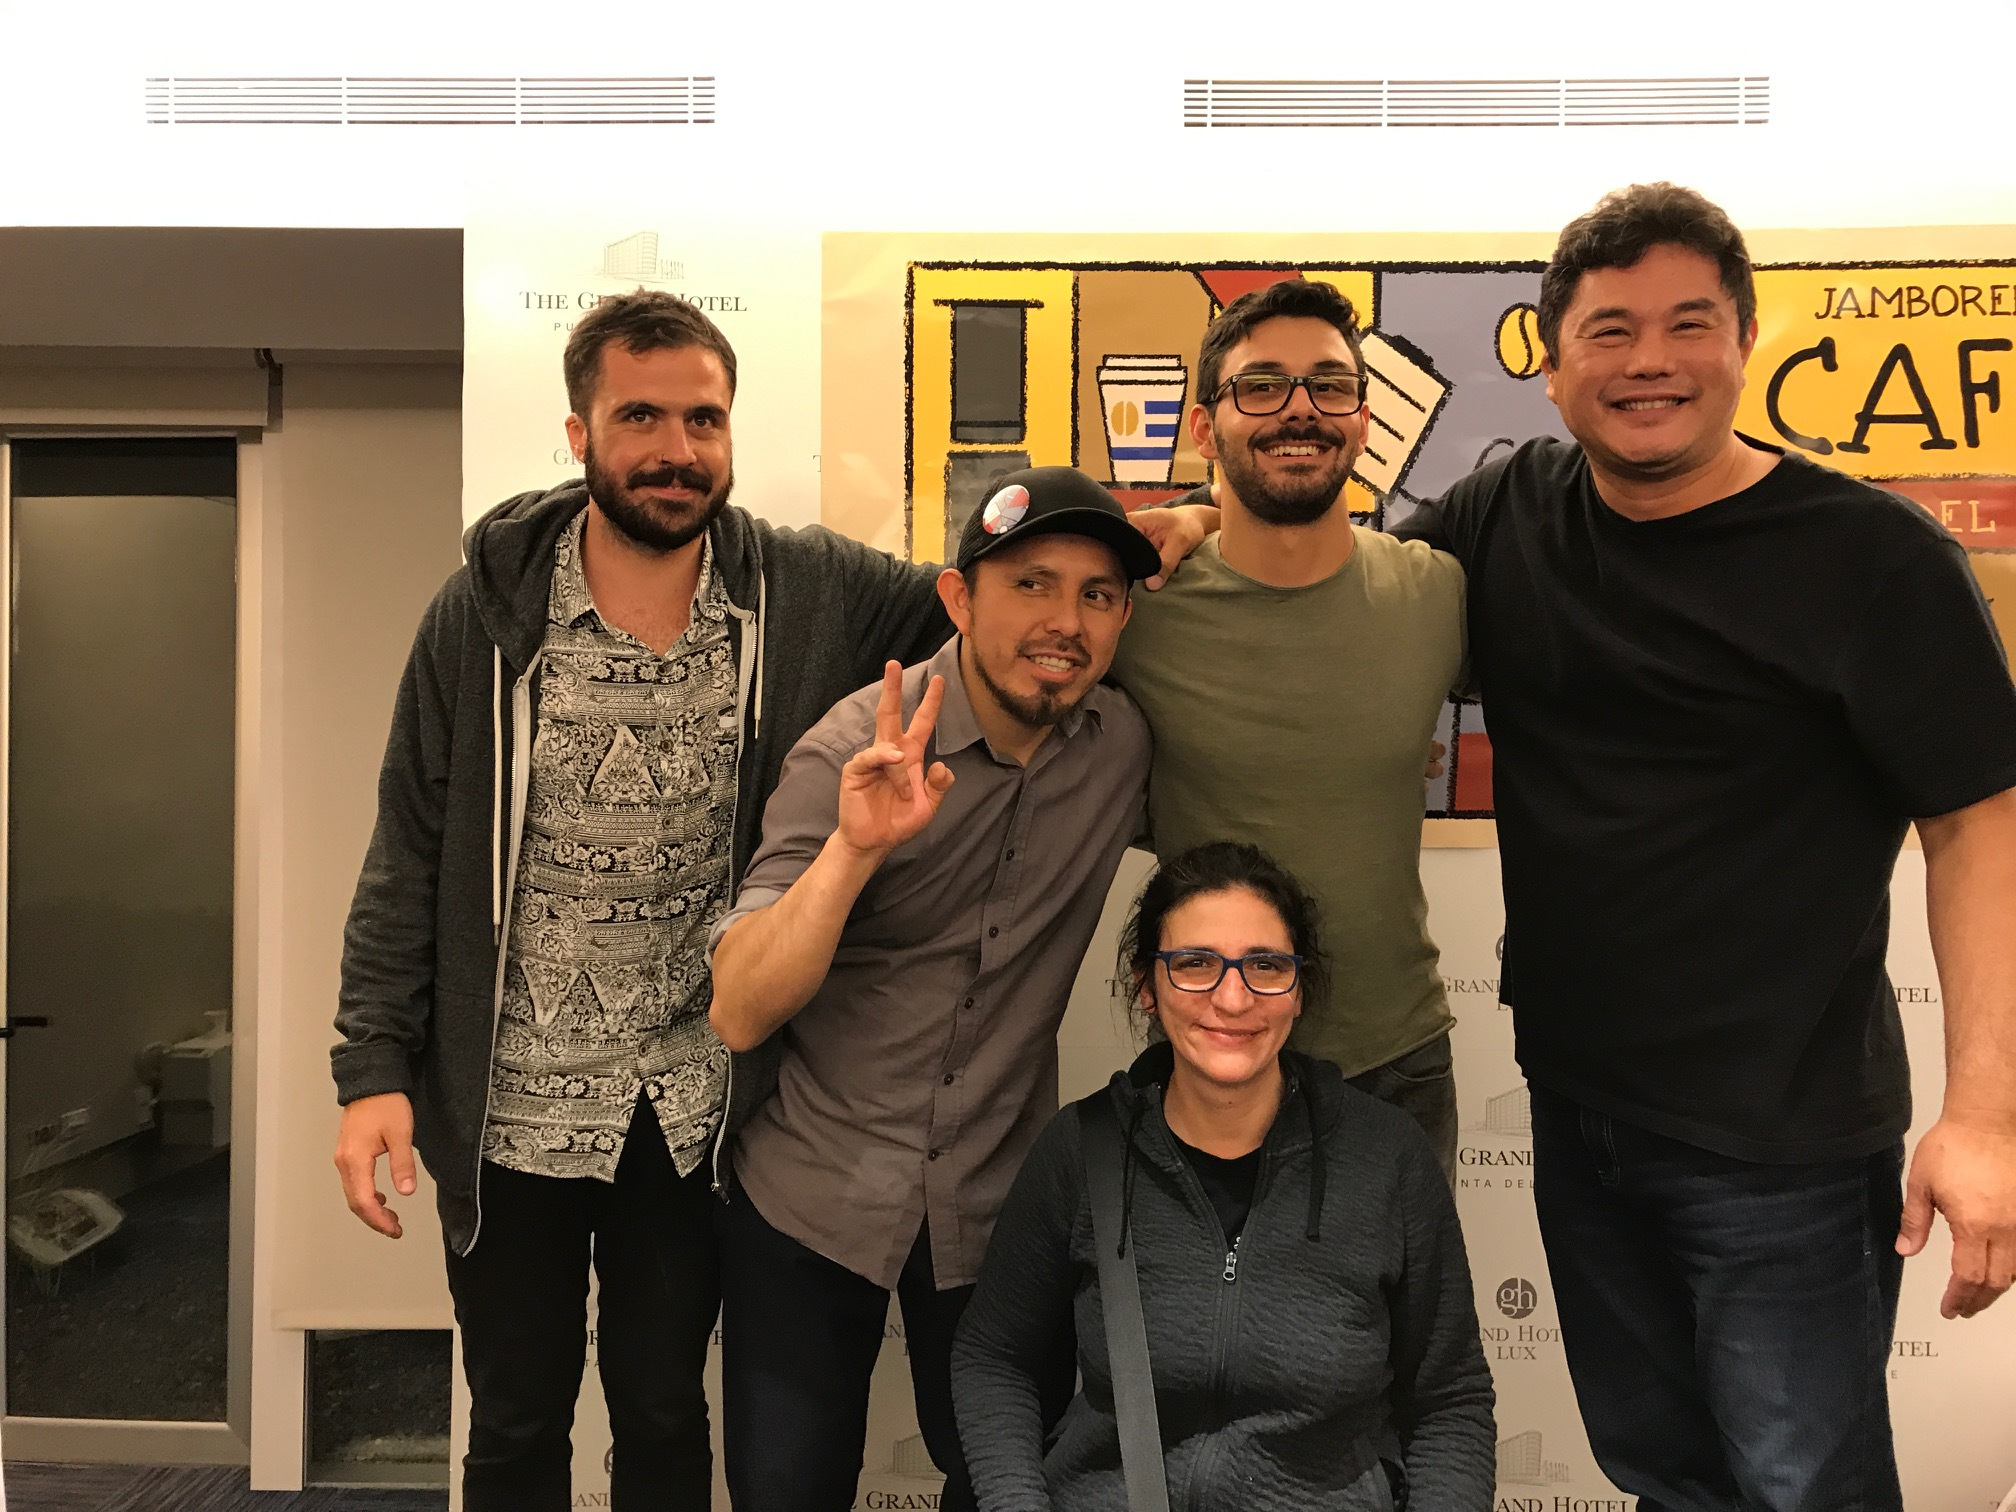 Nacho Gallo, Daniel Calderón, André Martinelli y Alicia Radi